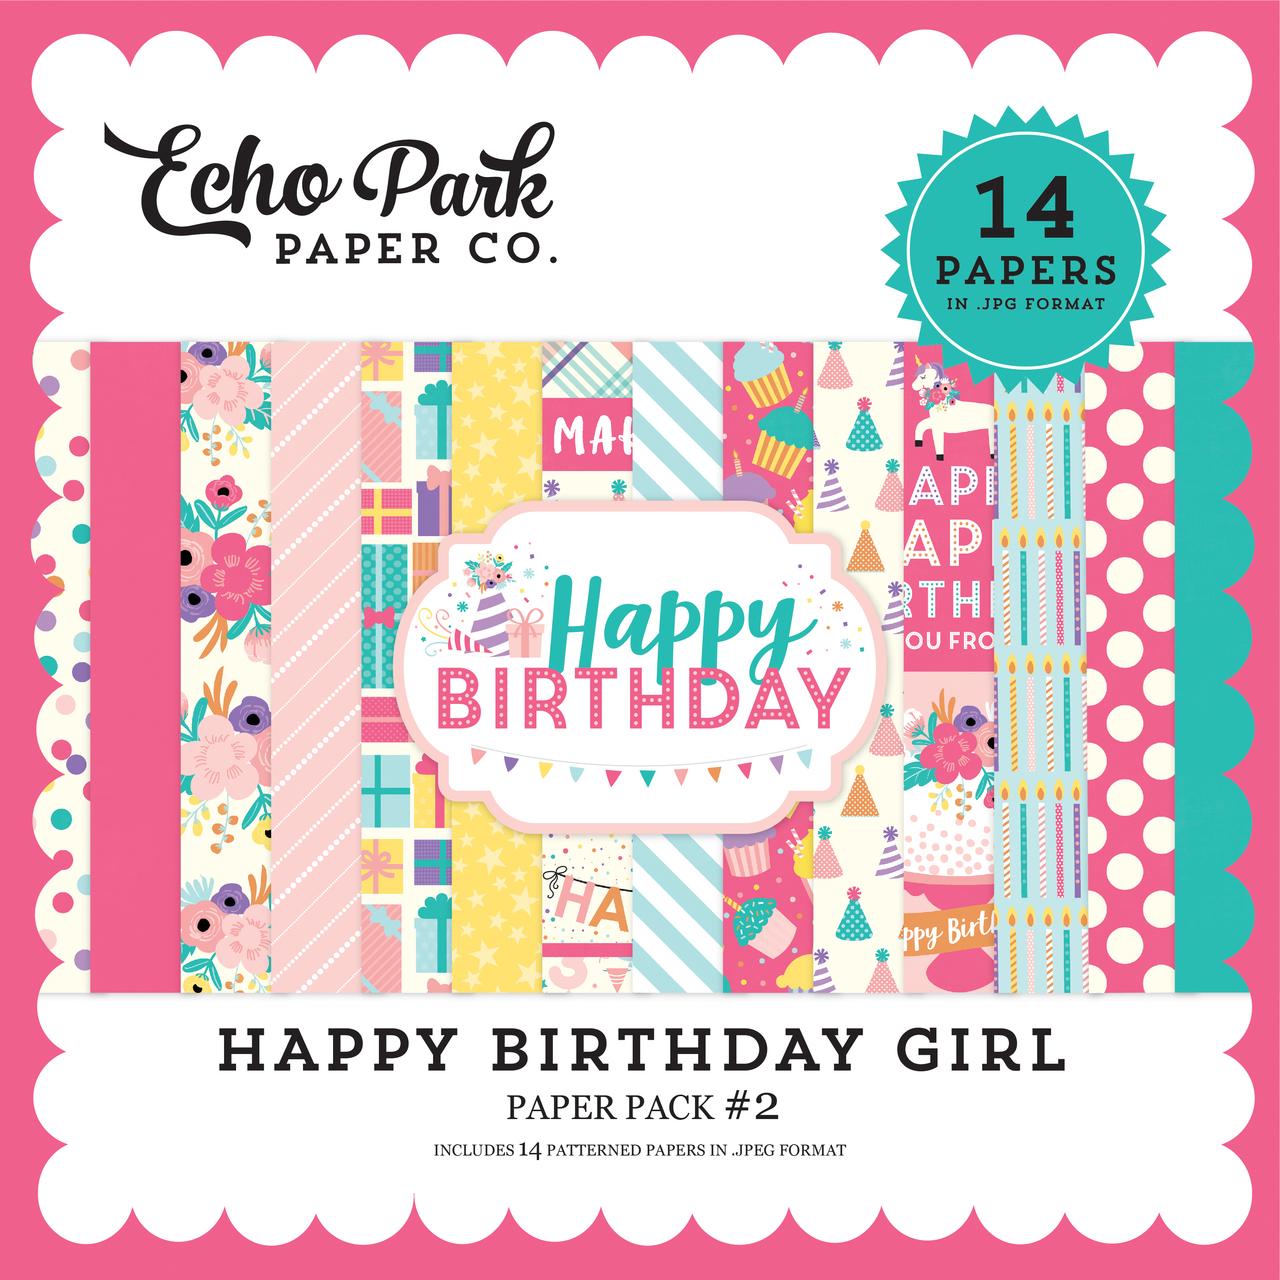 Happy Birthday Girl Paper Pack #2